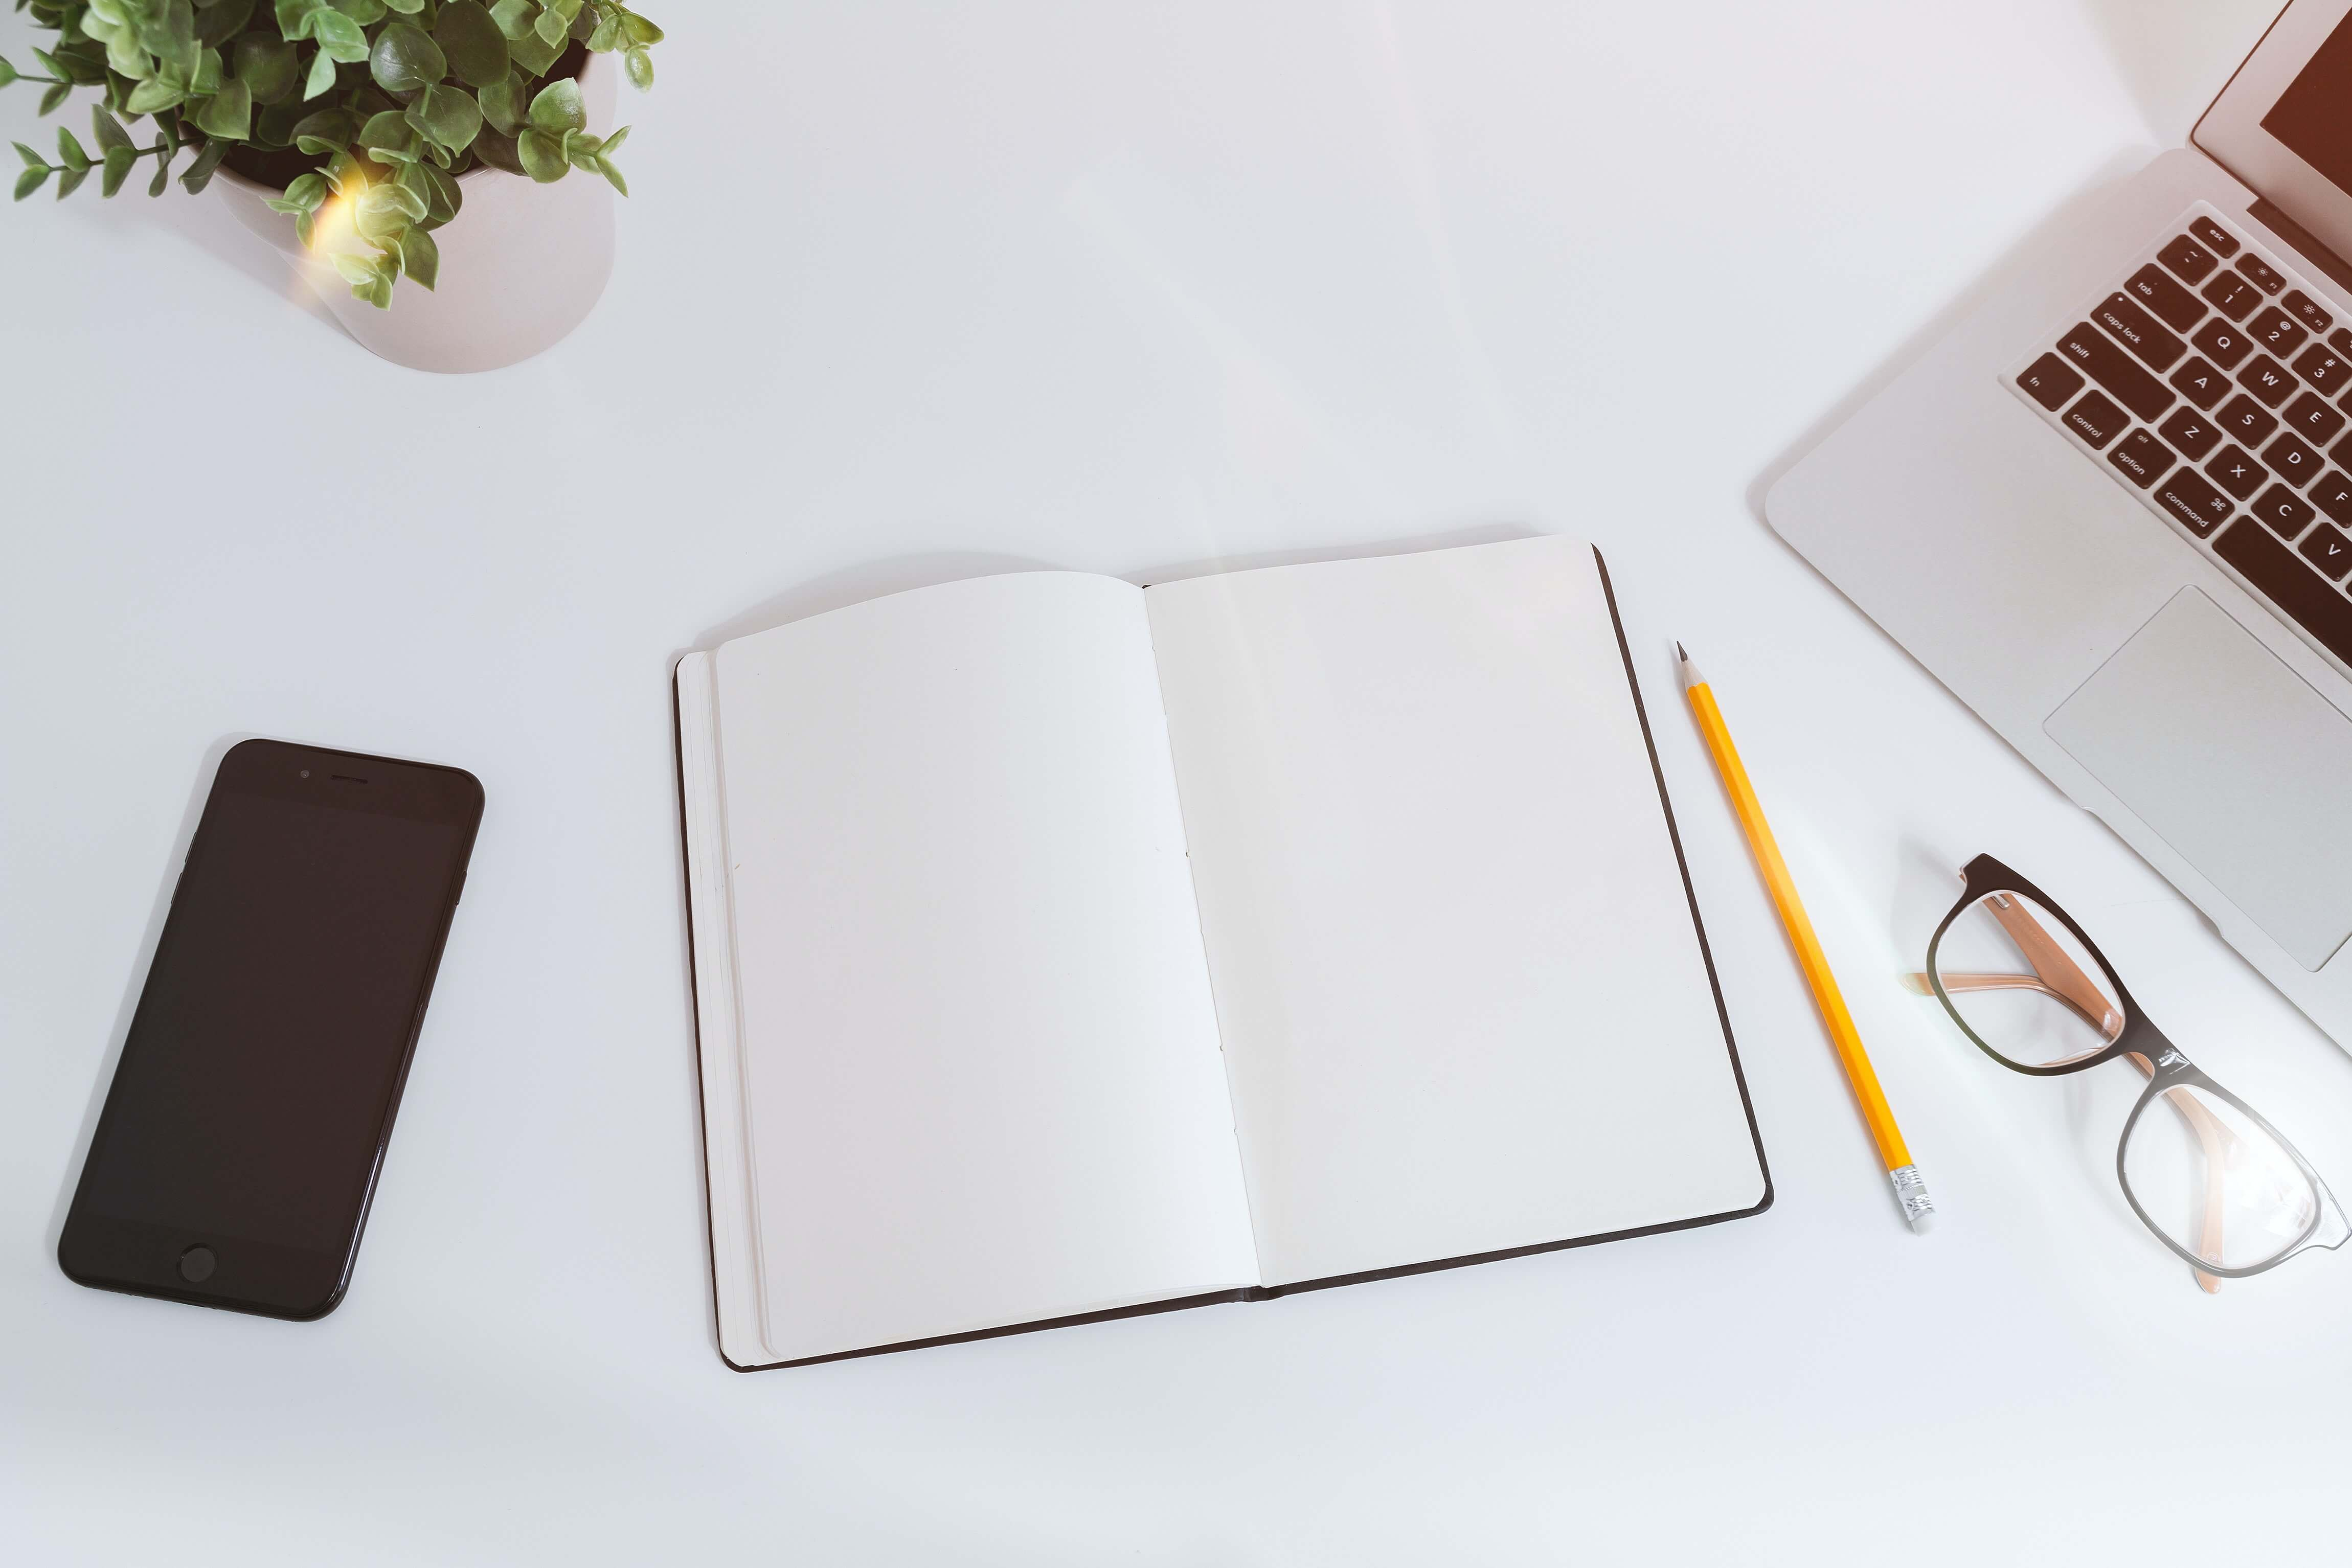 Phone-Notepad-Laptop